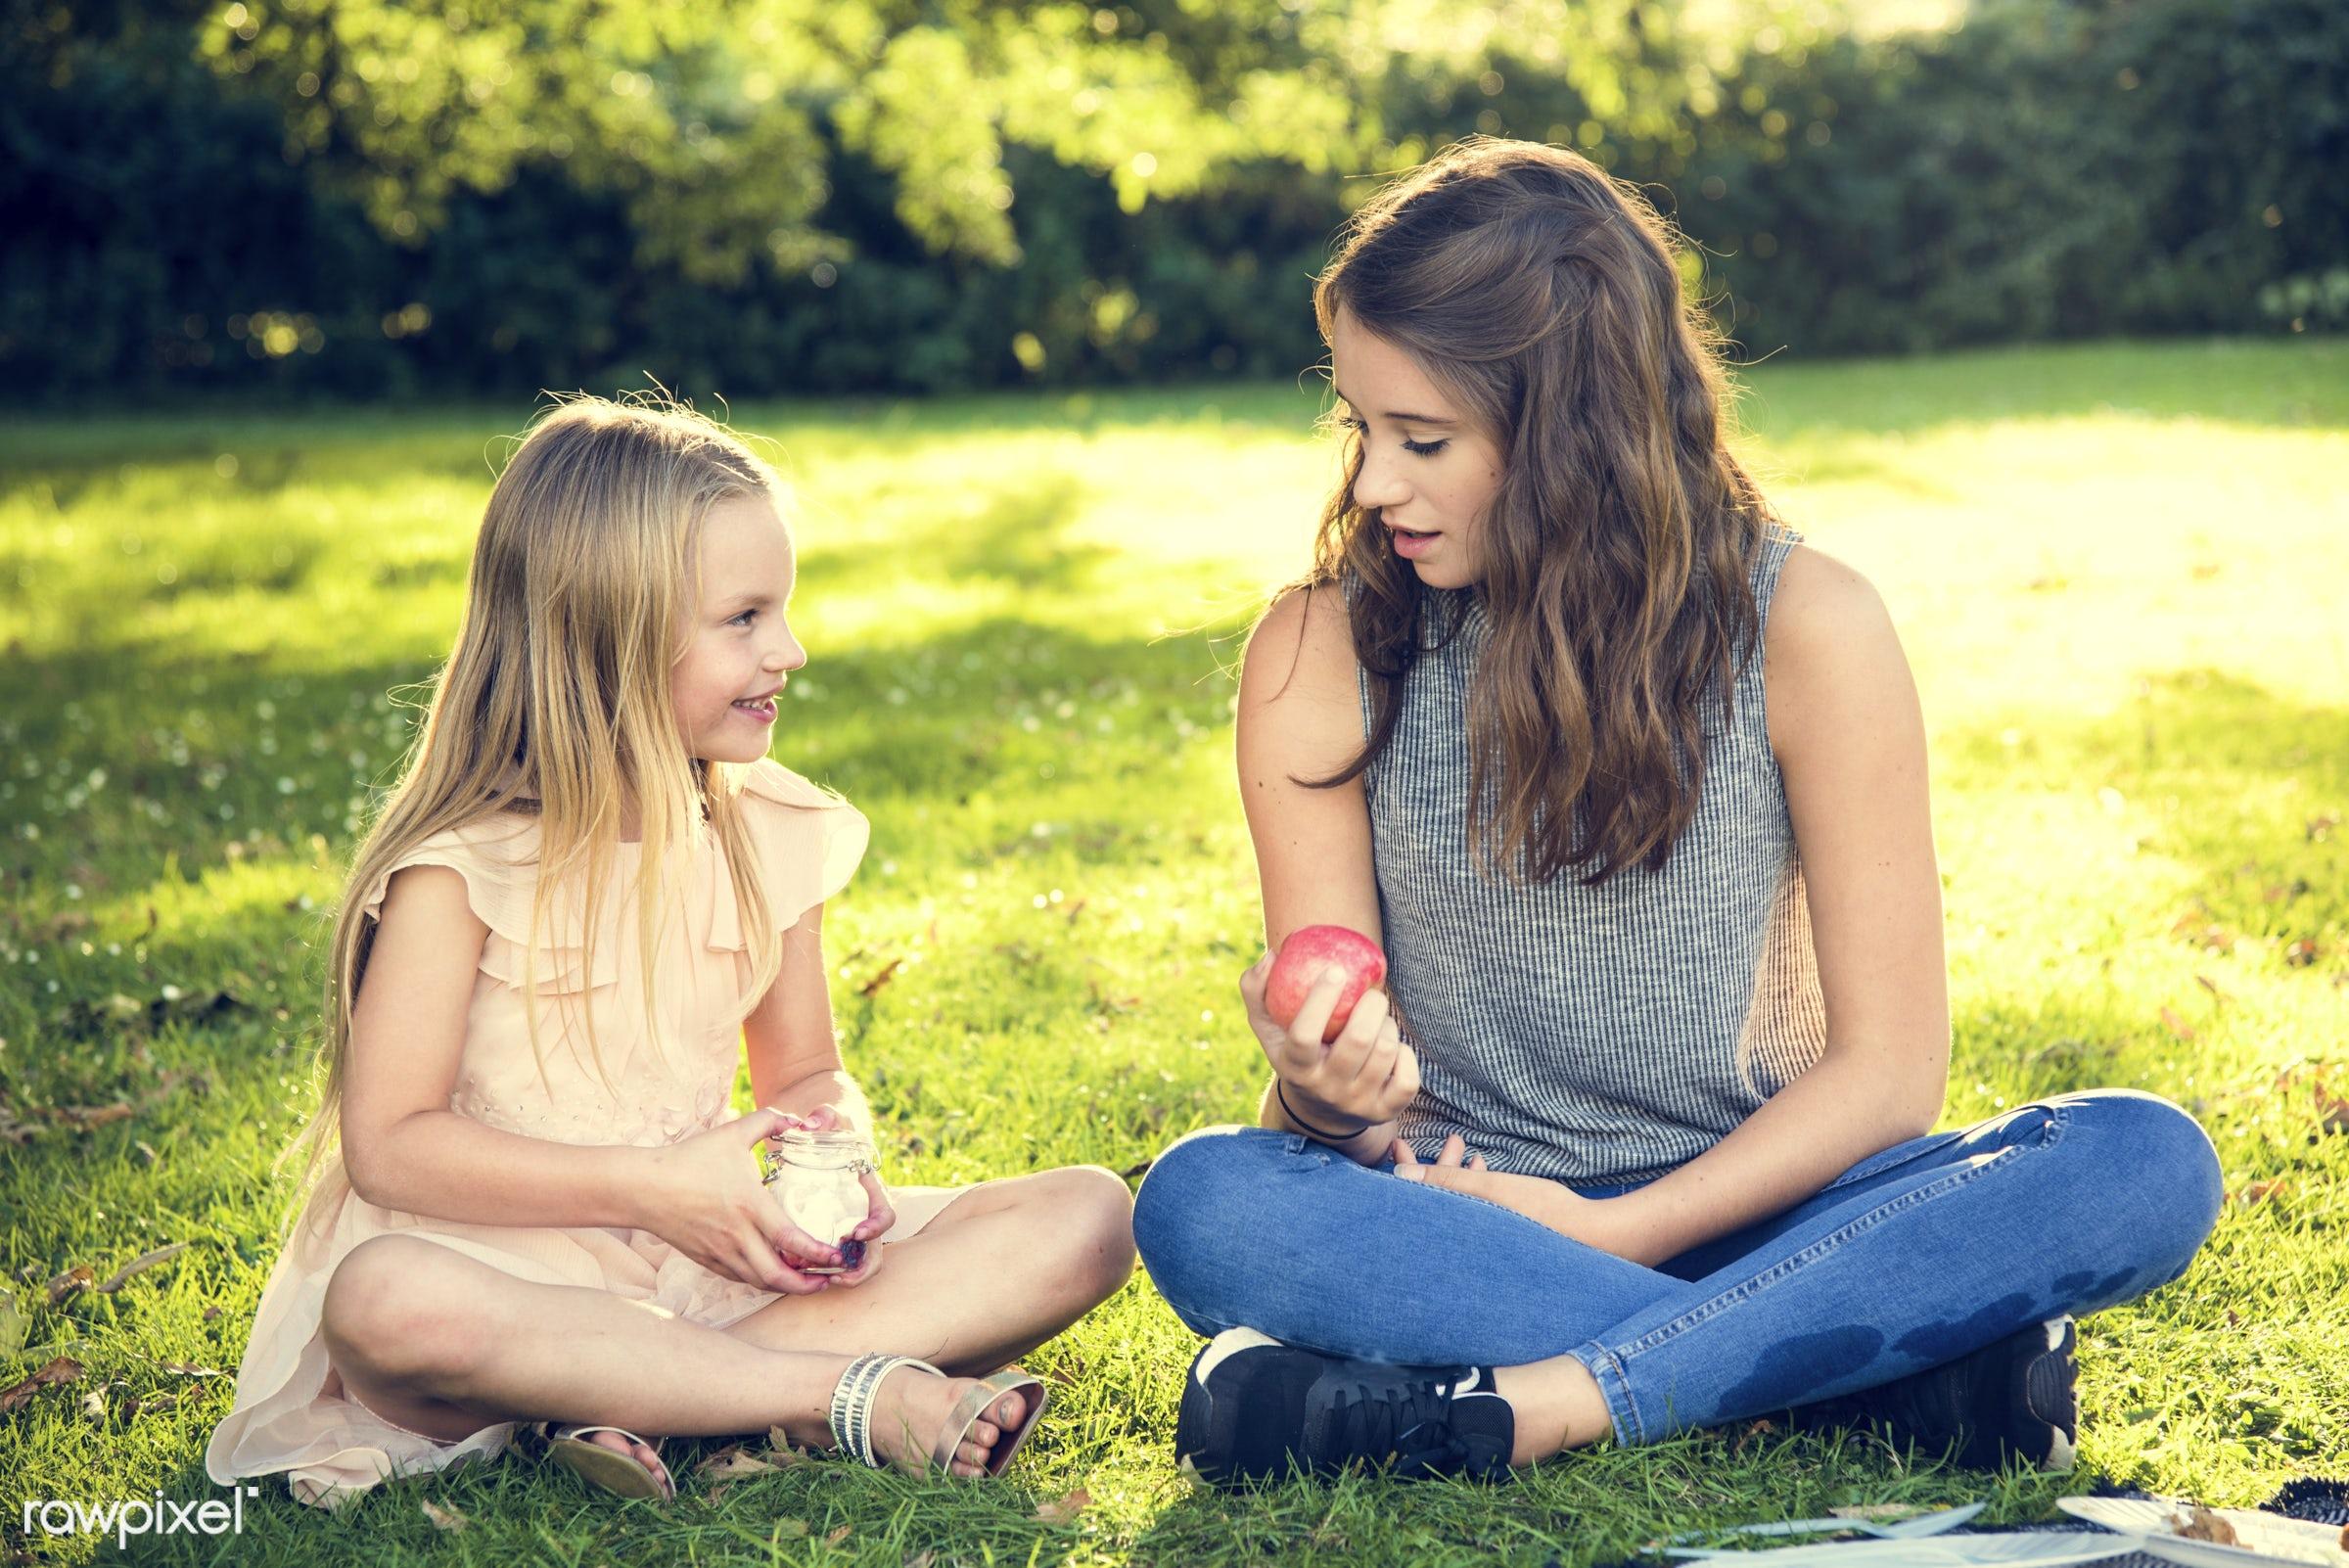 apple, bonding, care, casual, cheerful, childhood, children, enjoyment, environmental, family, field, food, fruit, fun,...